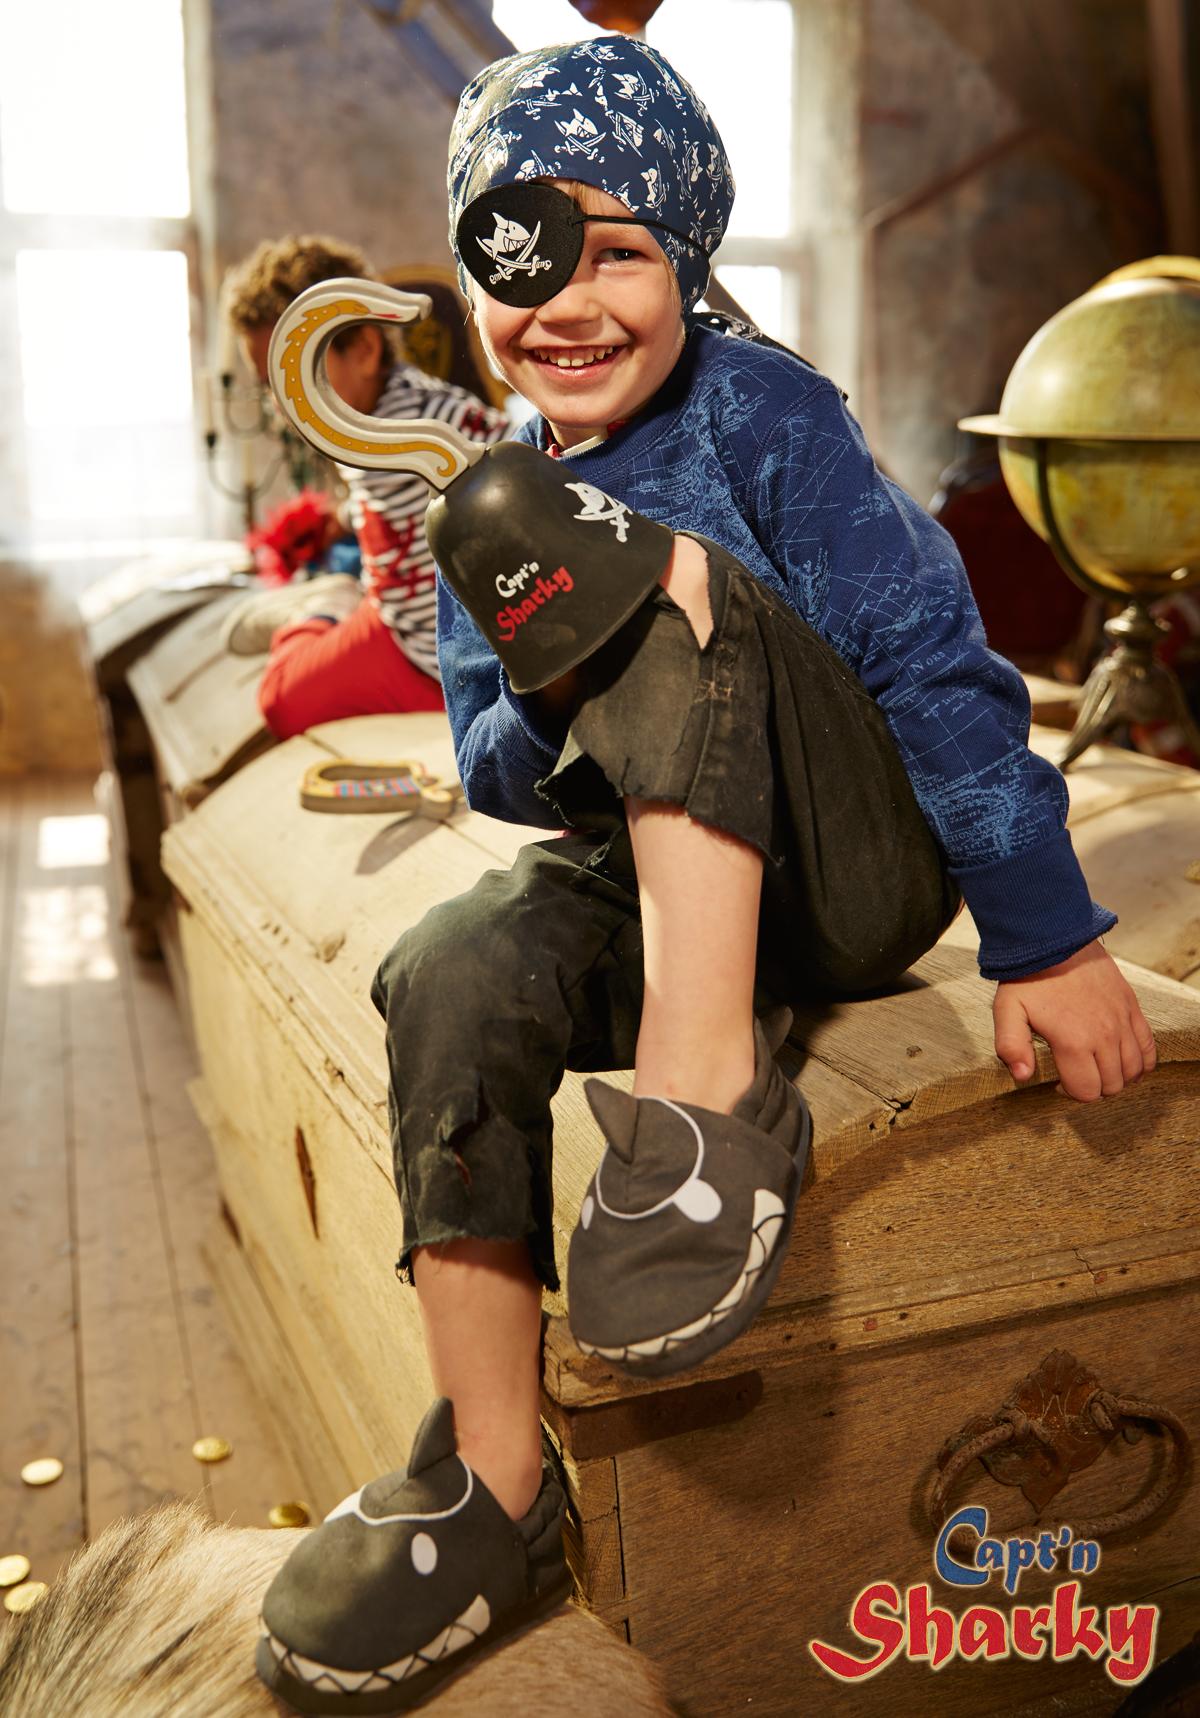 piraten verkleidungs utensilien von capt 39 n sharky capt 39 n sharky pinterest piraten kinder. Black Bedroom Furniture Sets. Home Design Ideas